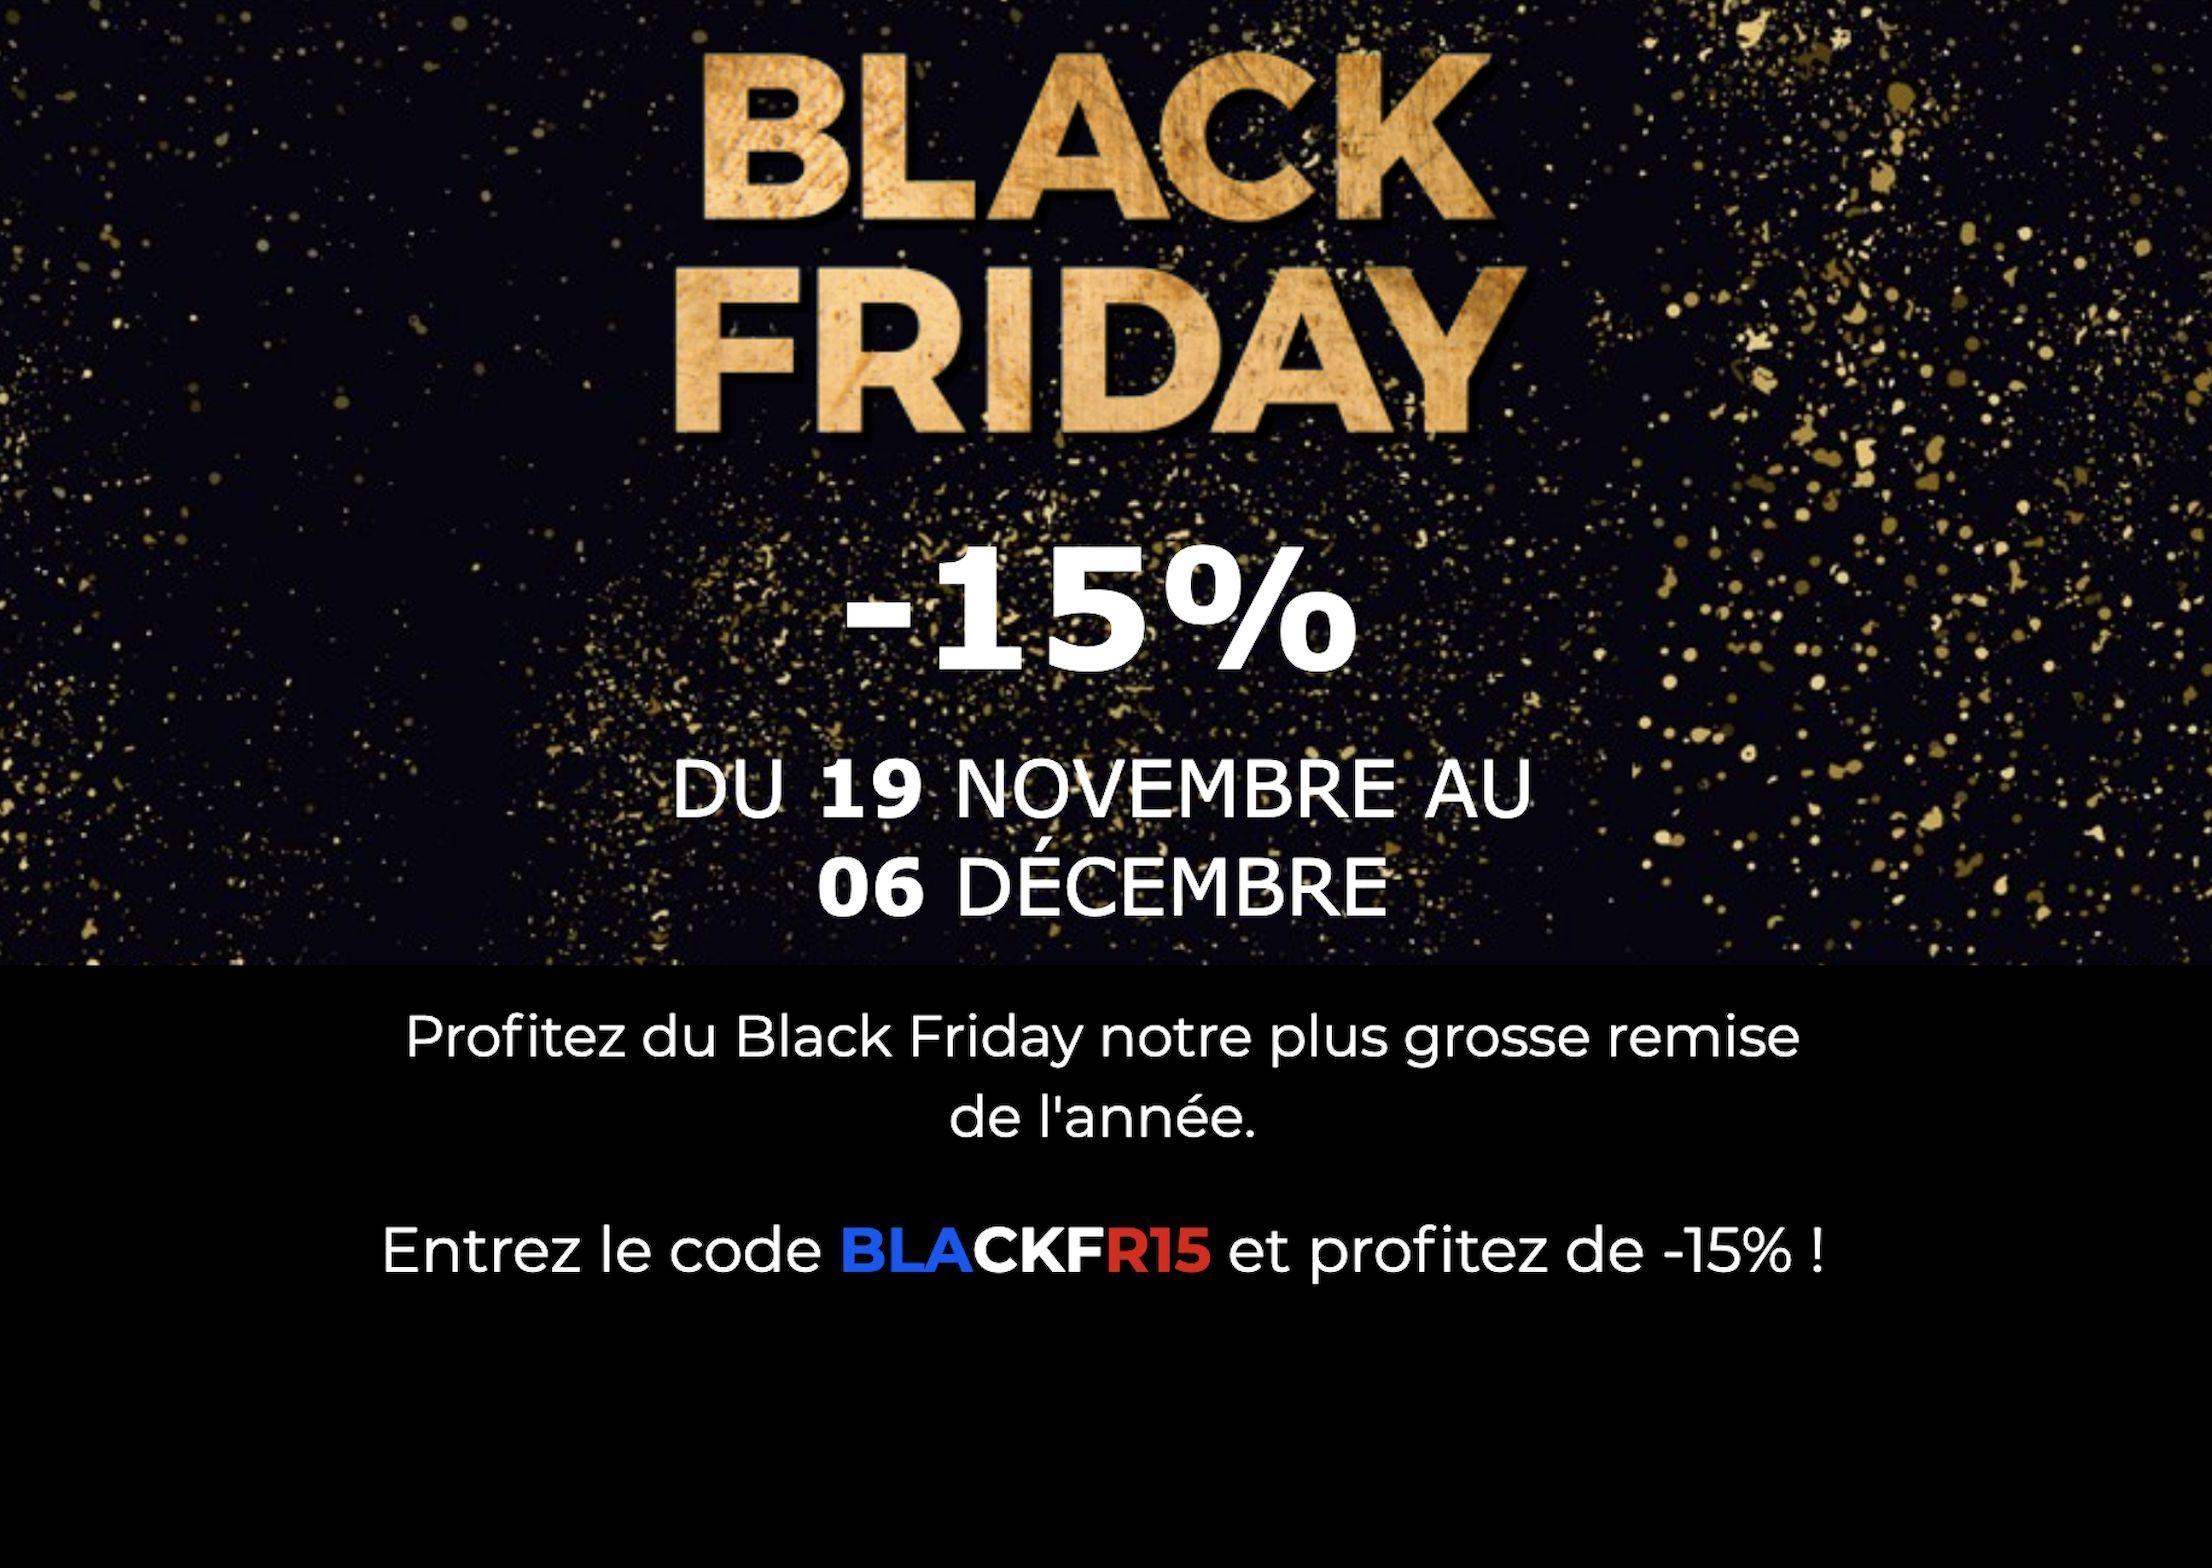 BLACK FRIDAY -15%